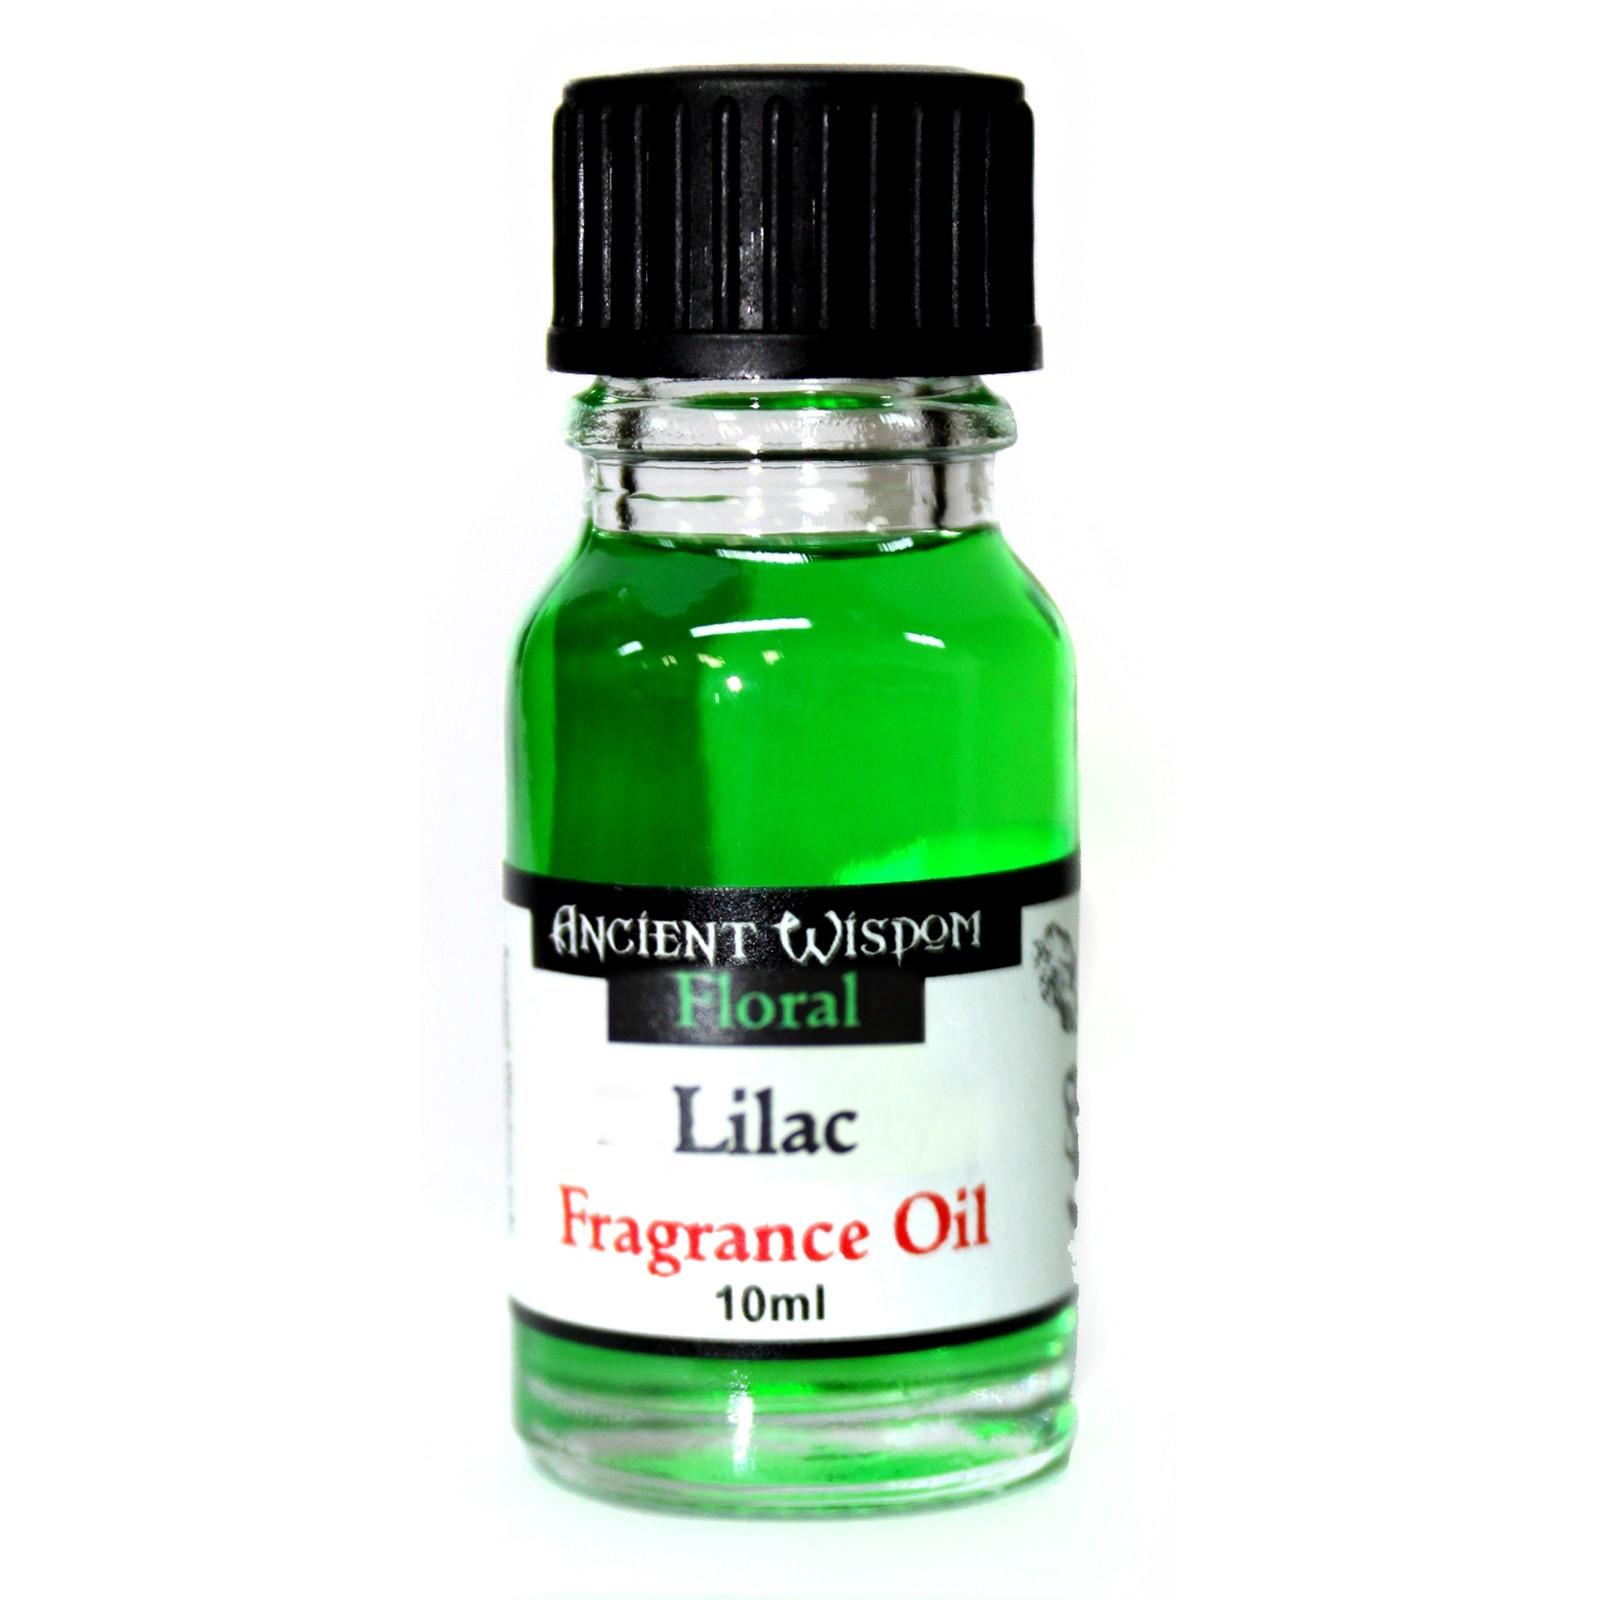 10ml Lilac Fragrance Oil